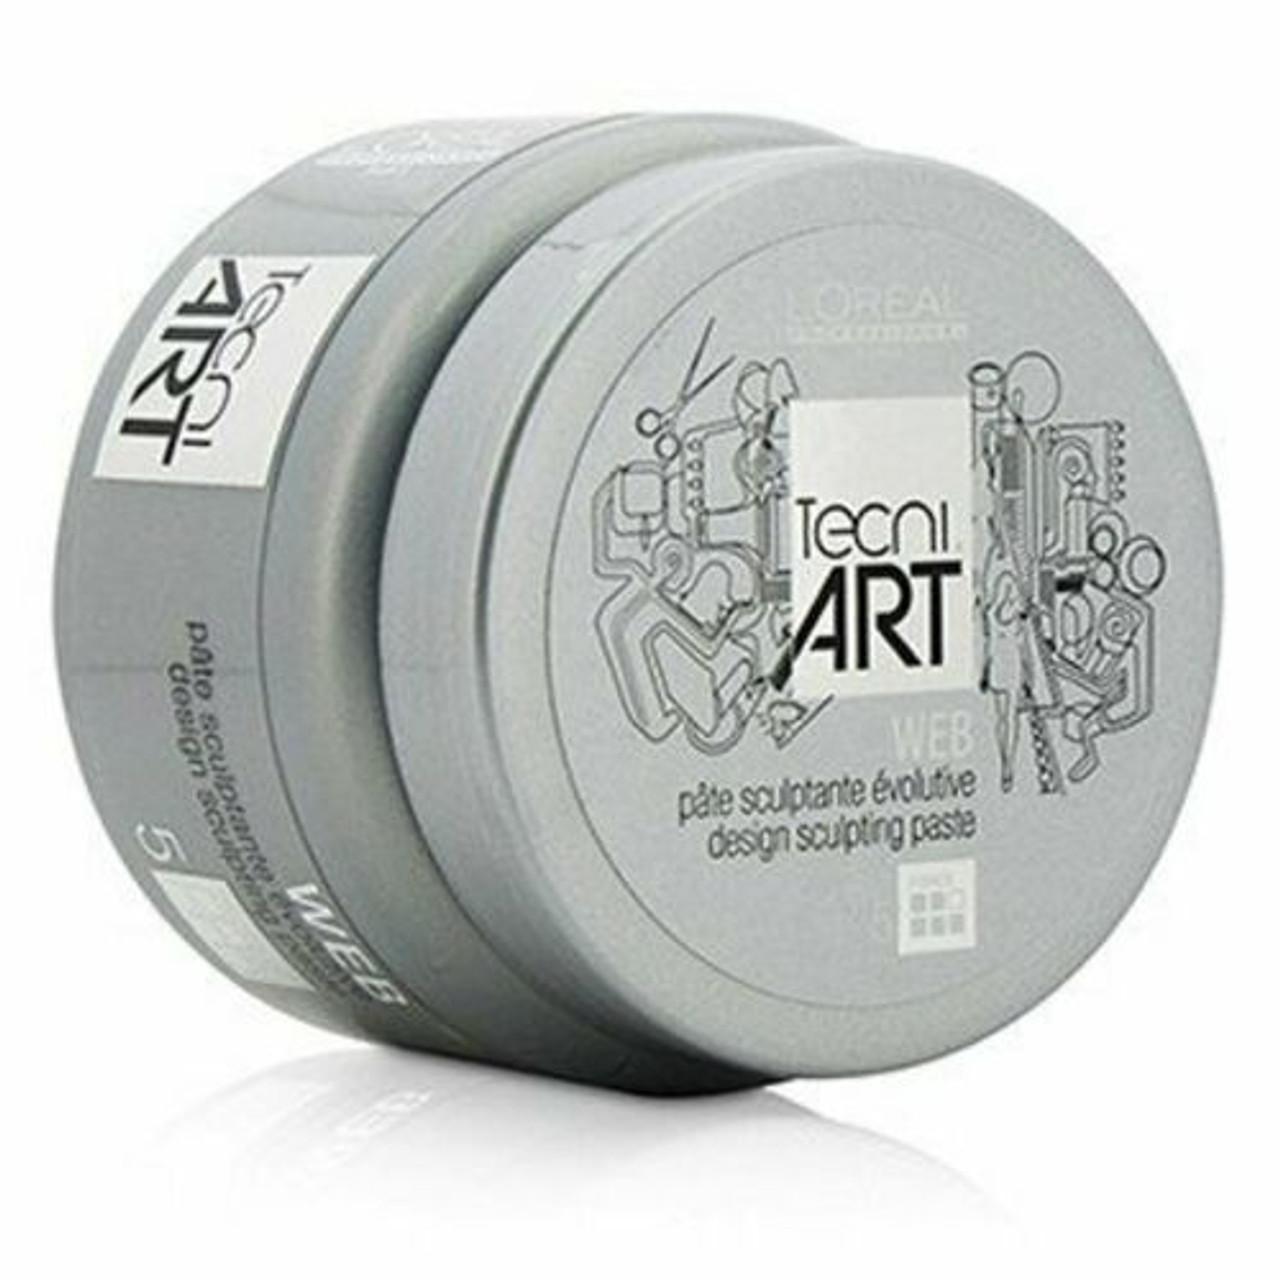 L'Oreal Professionnel Tecni. Art A Head Web - Design Sculpting Paste- 5 oz